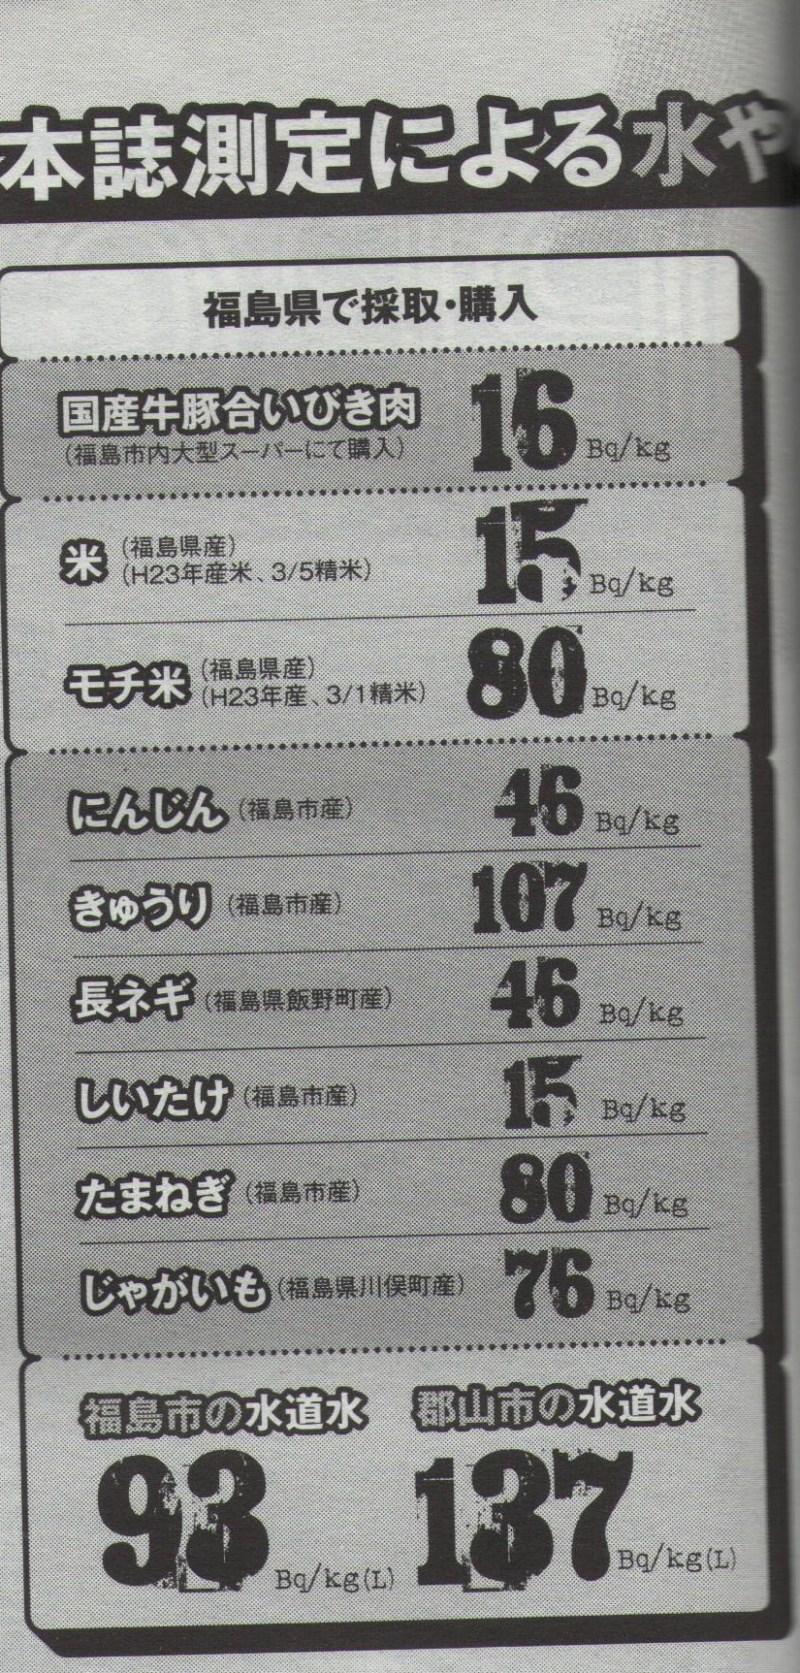 186 Bq/Kg from tap water in Kashiwa2